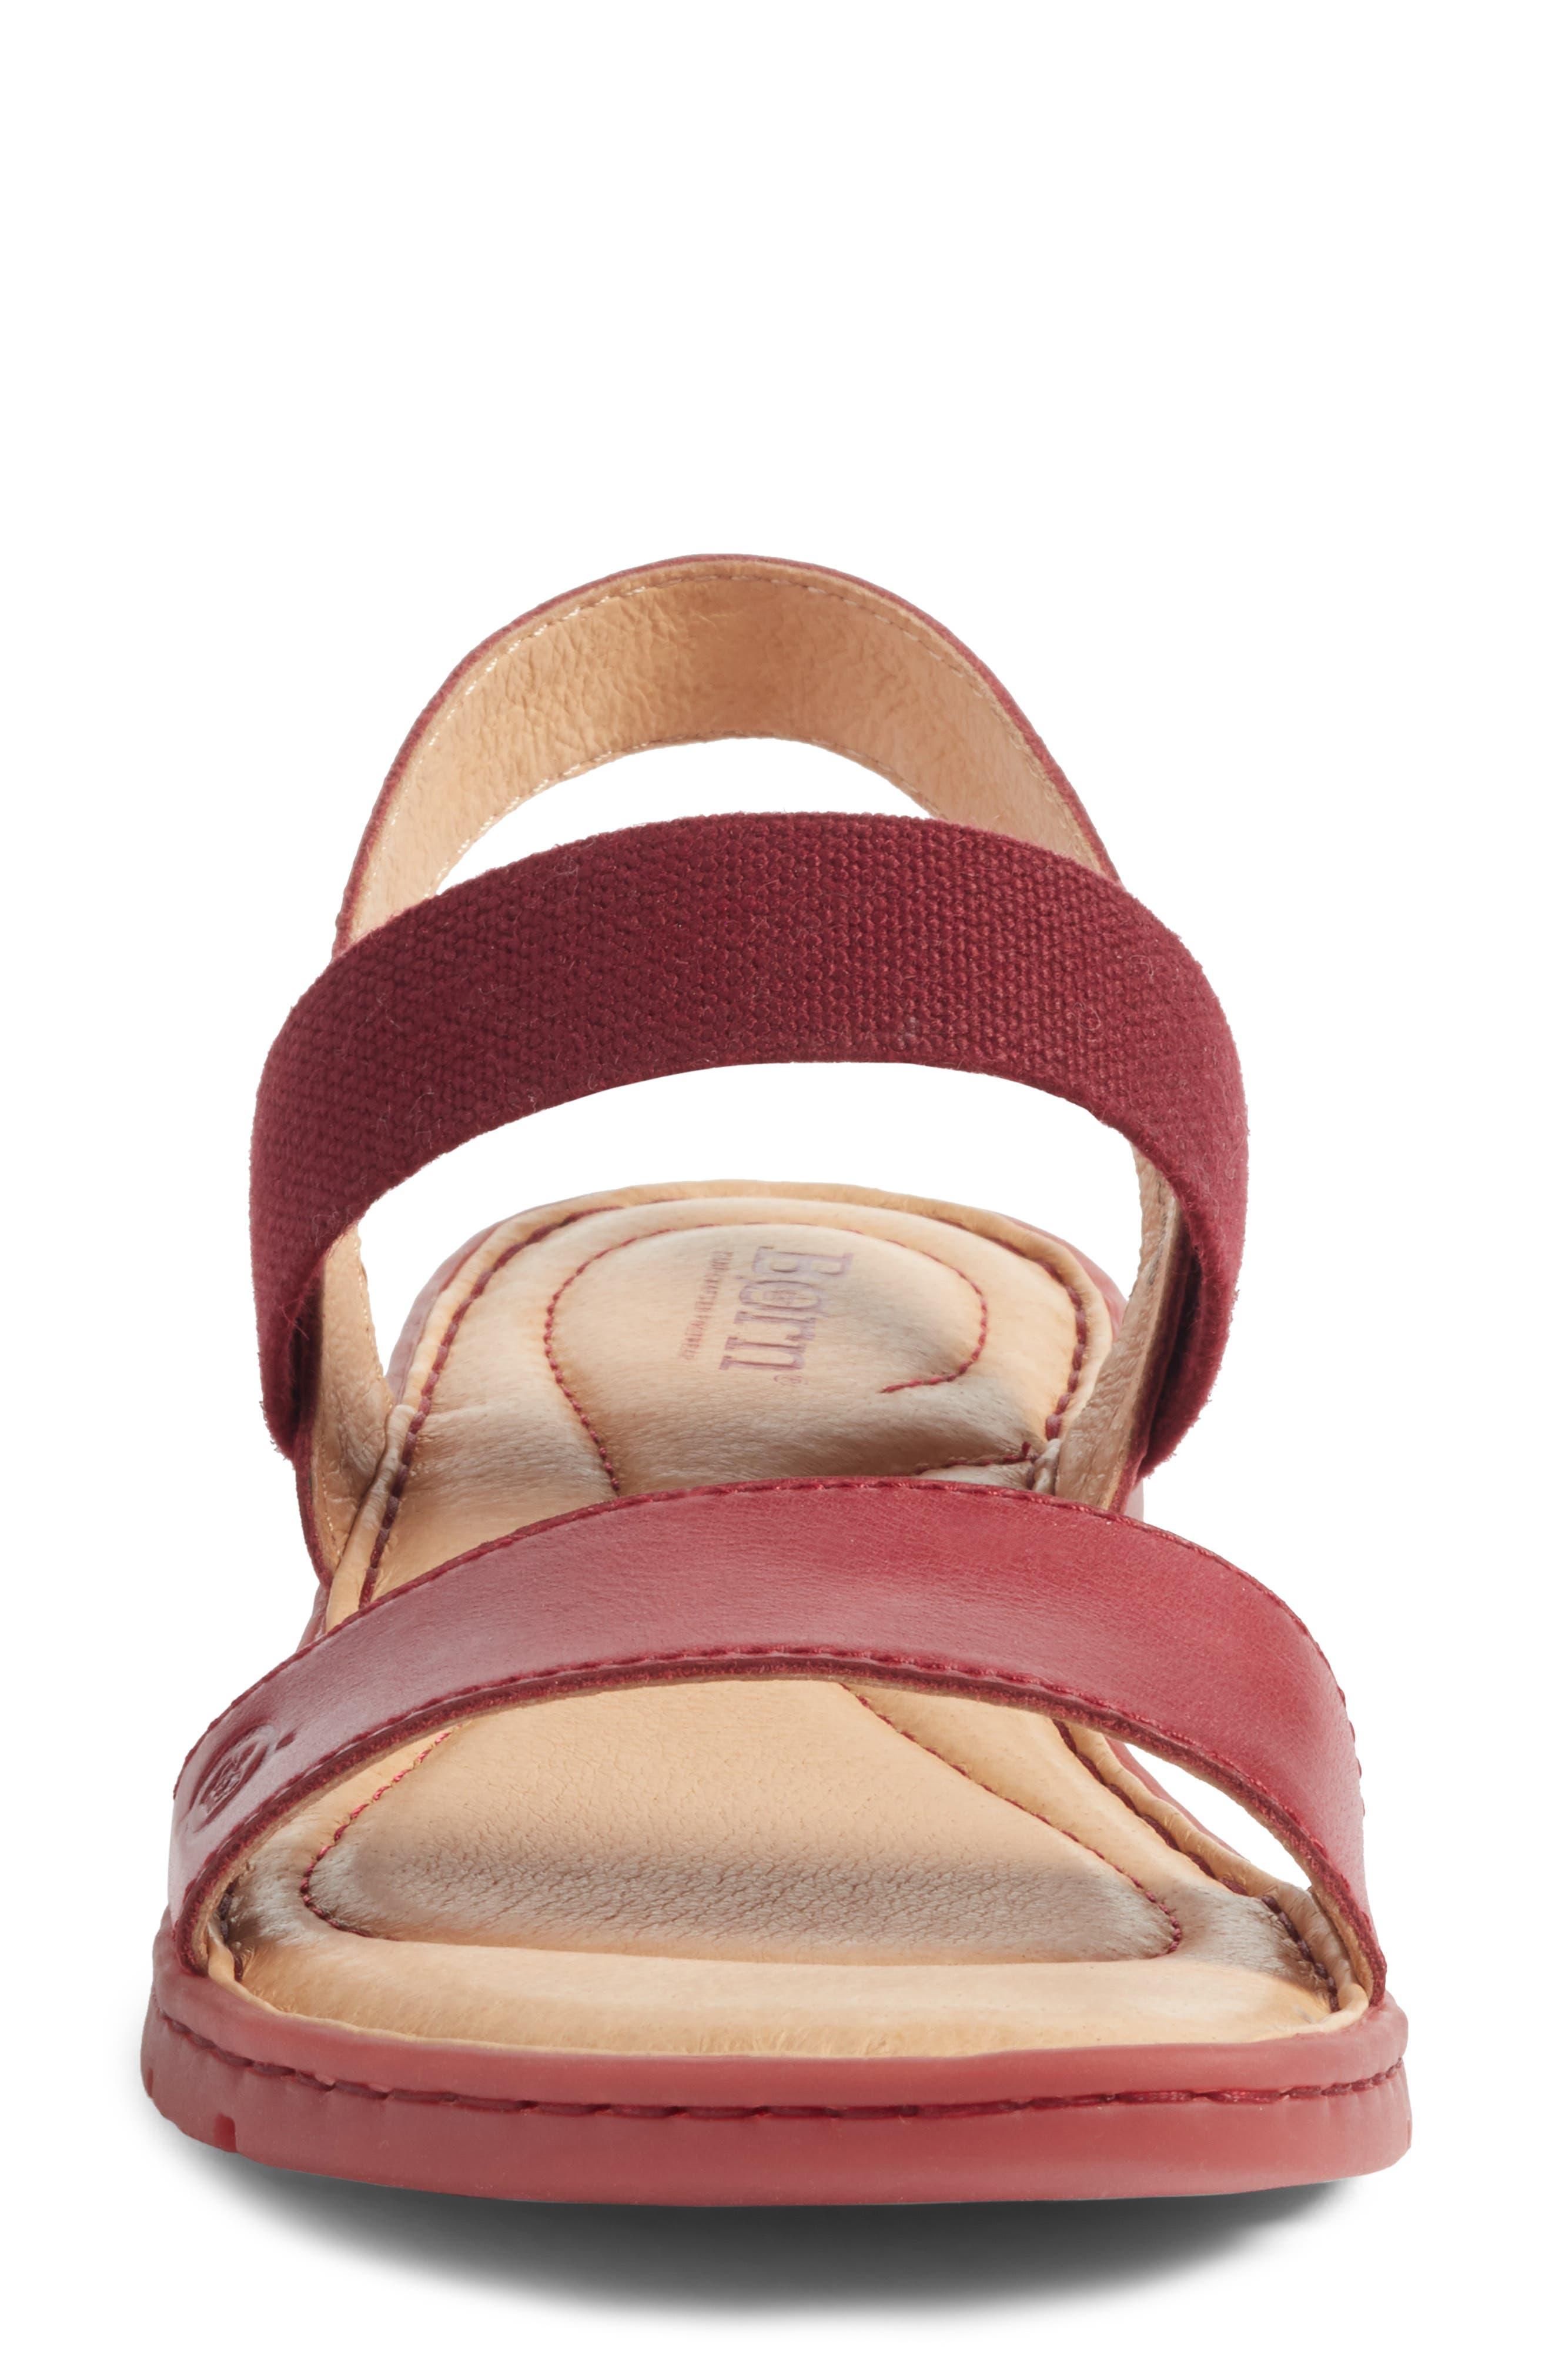 Börn Elstar Sandal,                             Alternate thumbnail 4, color,                             Red Leather